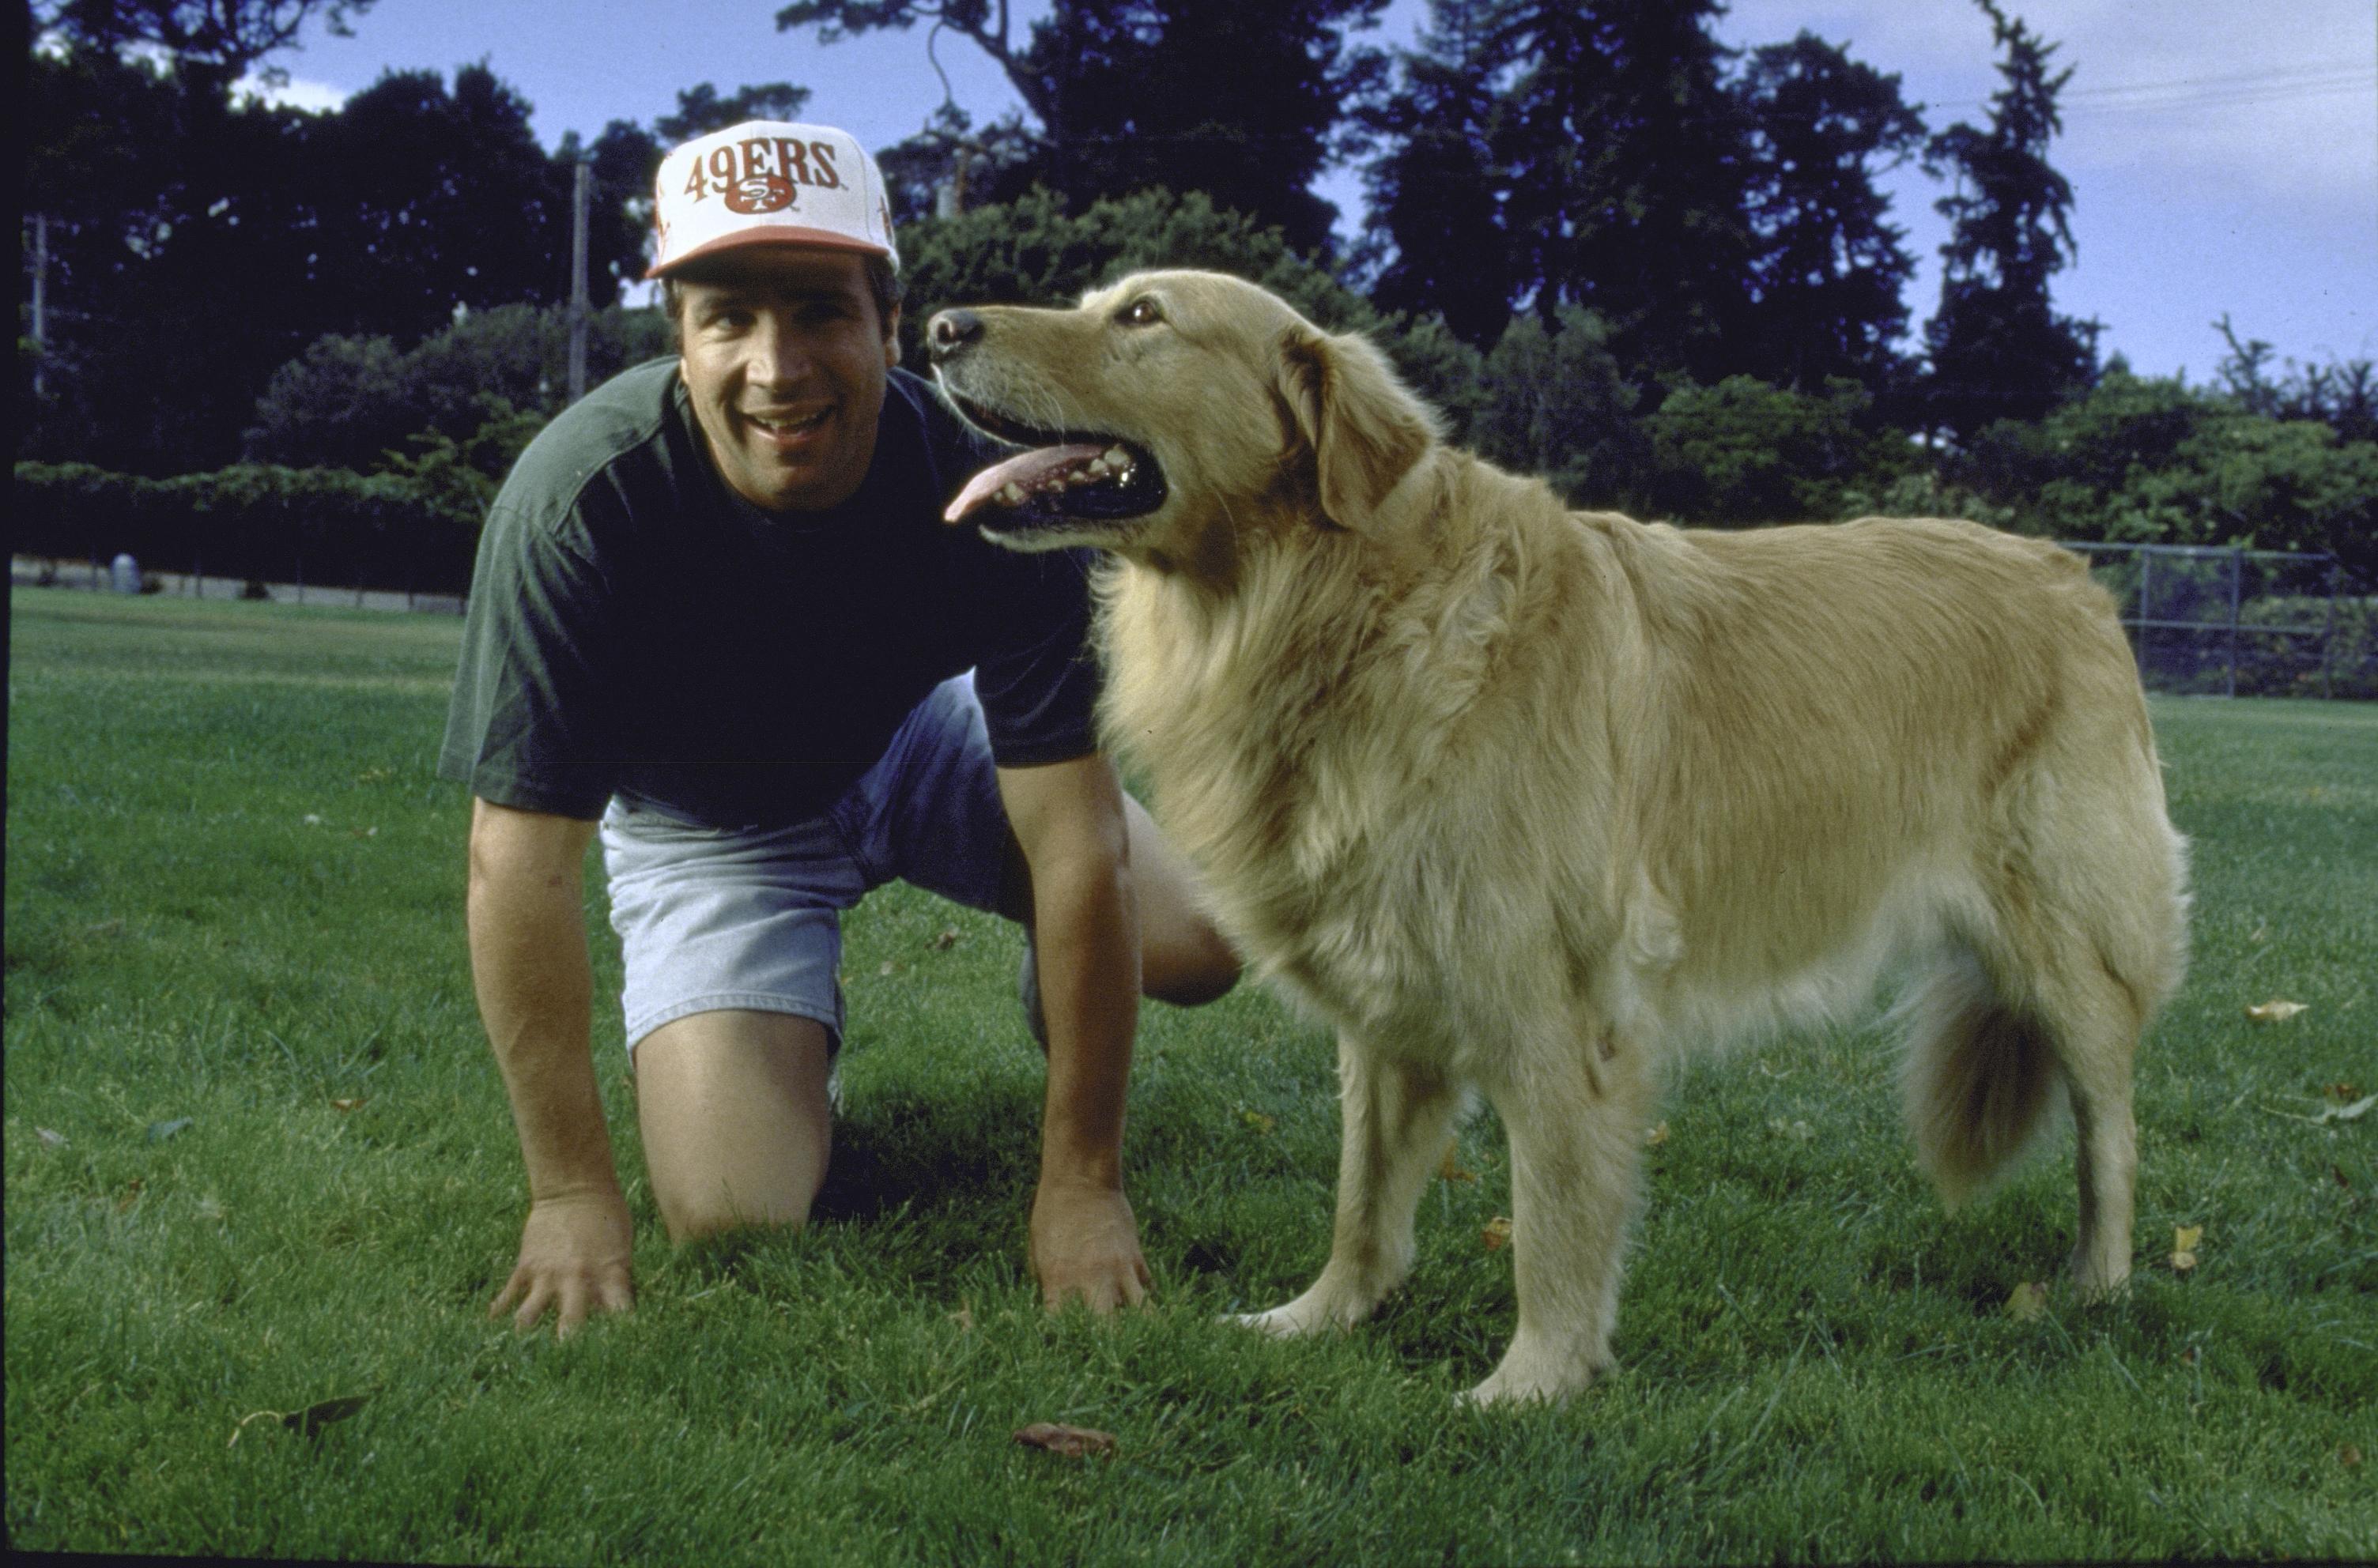 Golden retriever dog Buddy basketball-playing star of